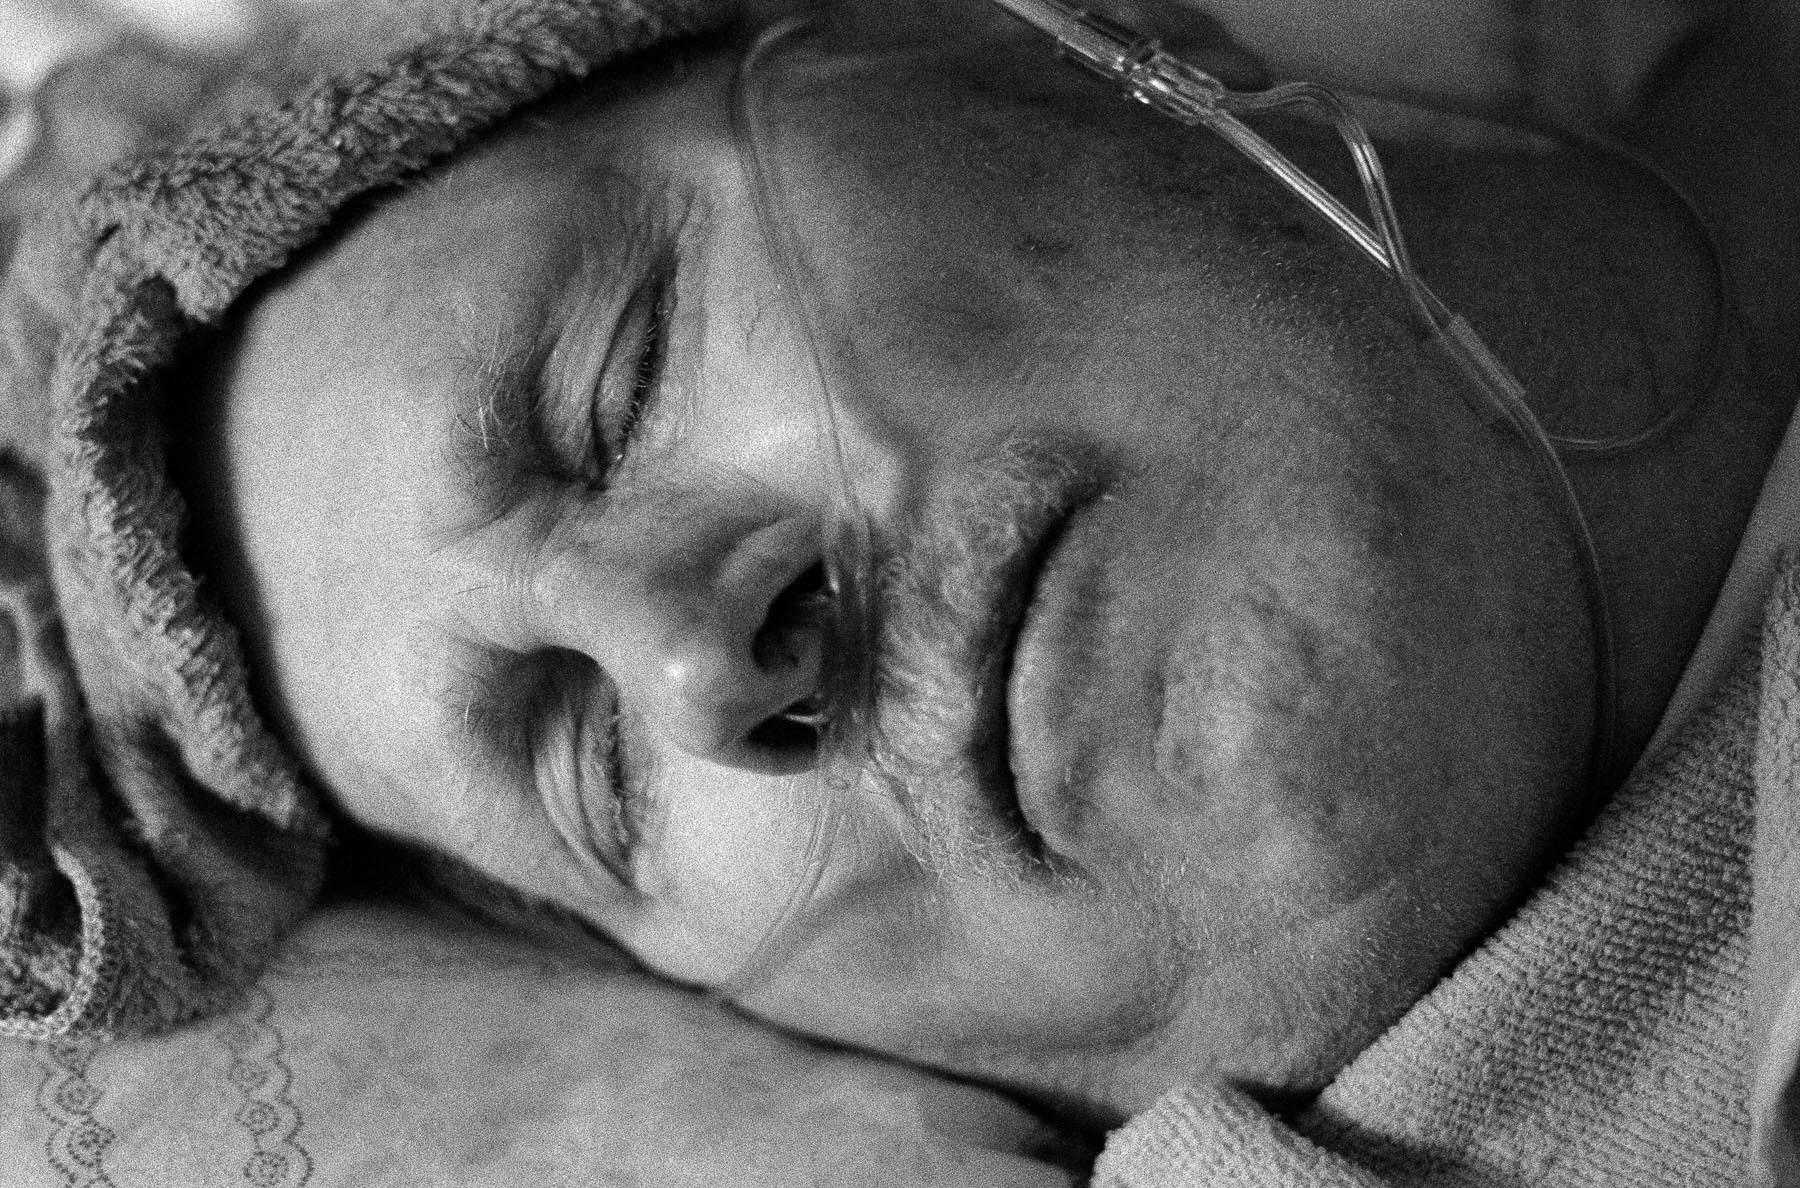 Home Hospice Care, Oshkosh, WI, 2002